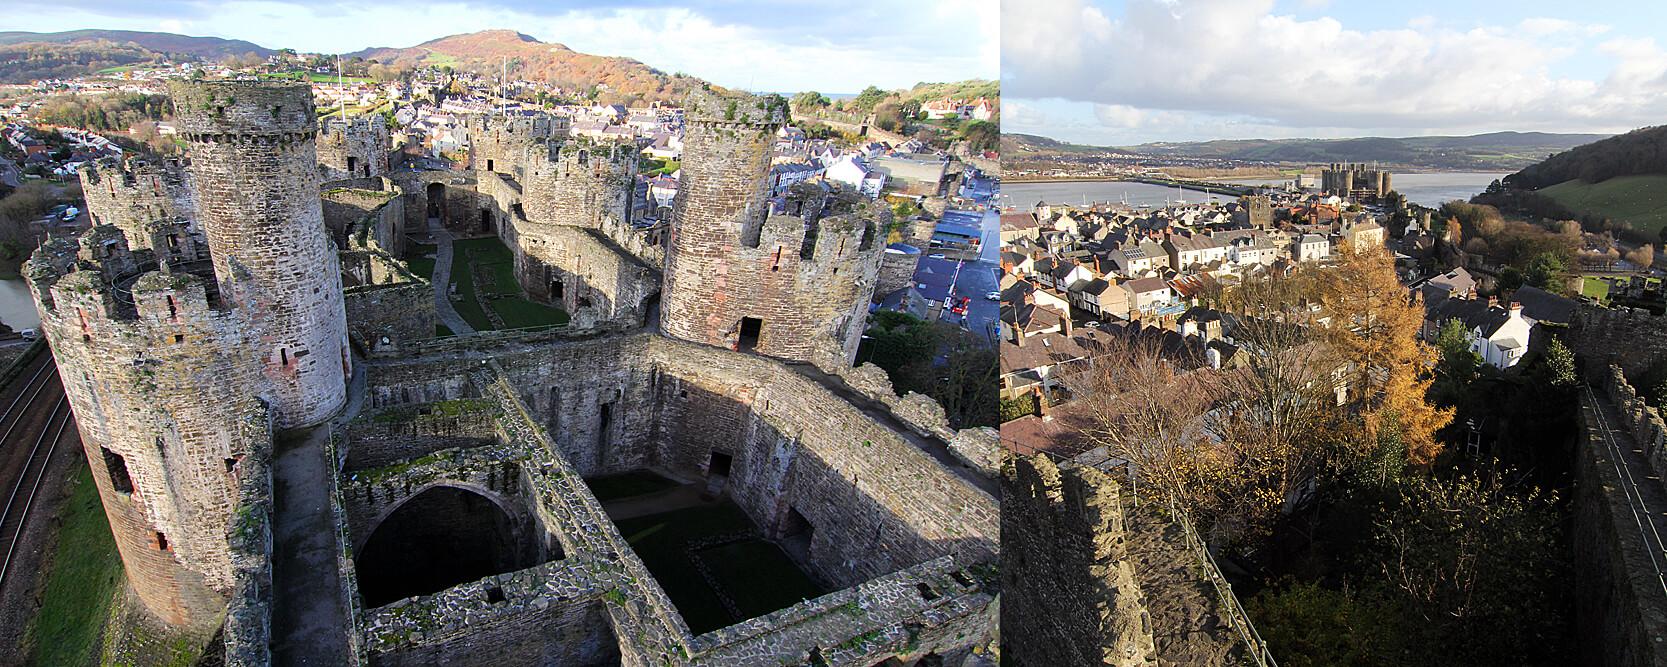 wales-sehenswurdigkeiten-conwy-castle (1)